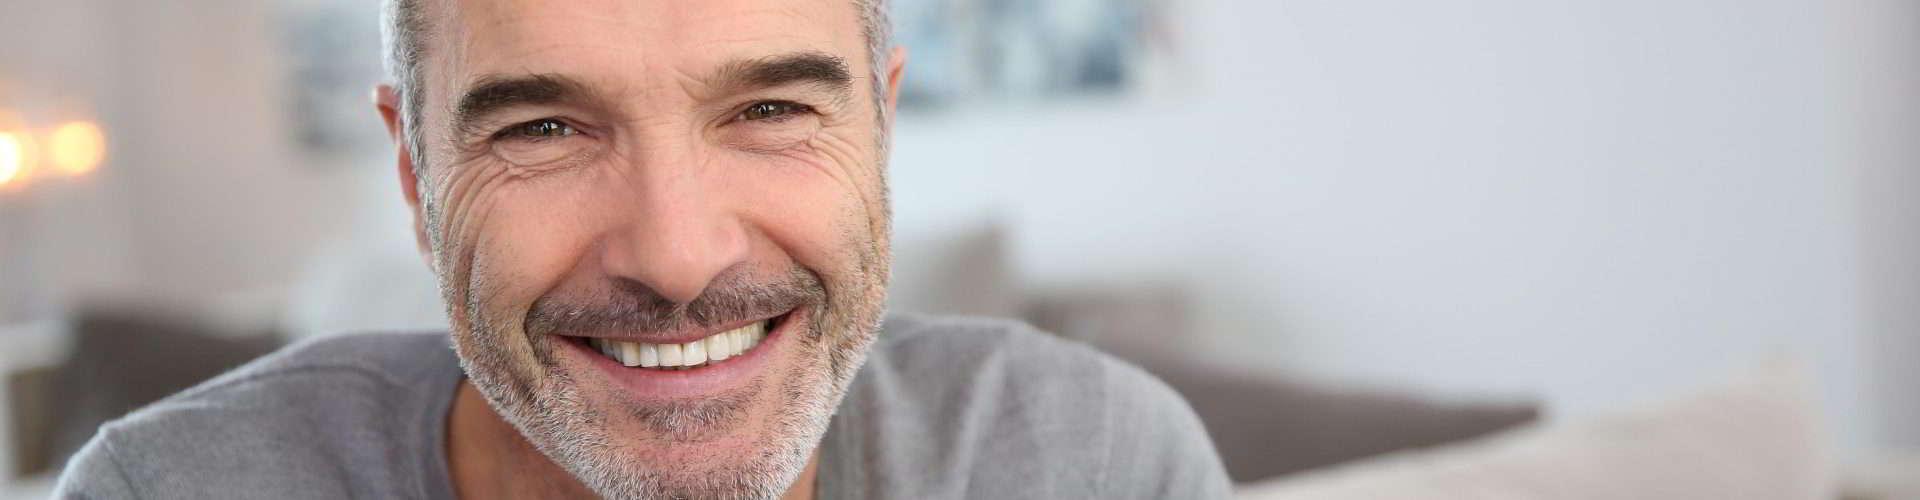 IVI efeitos menopausa masculina